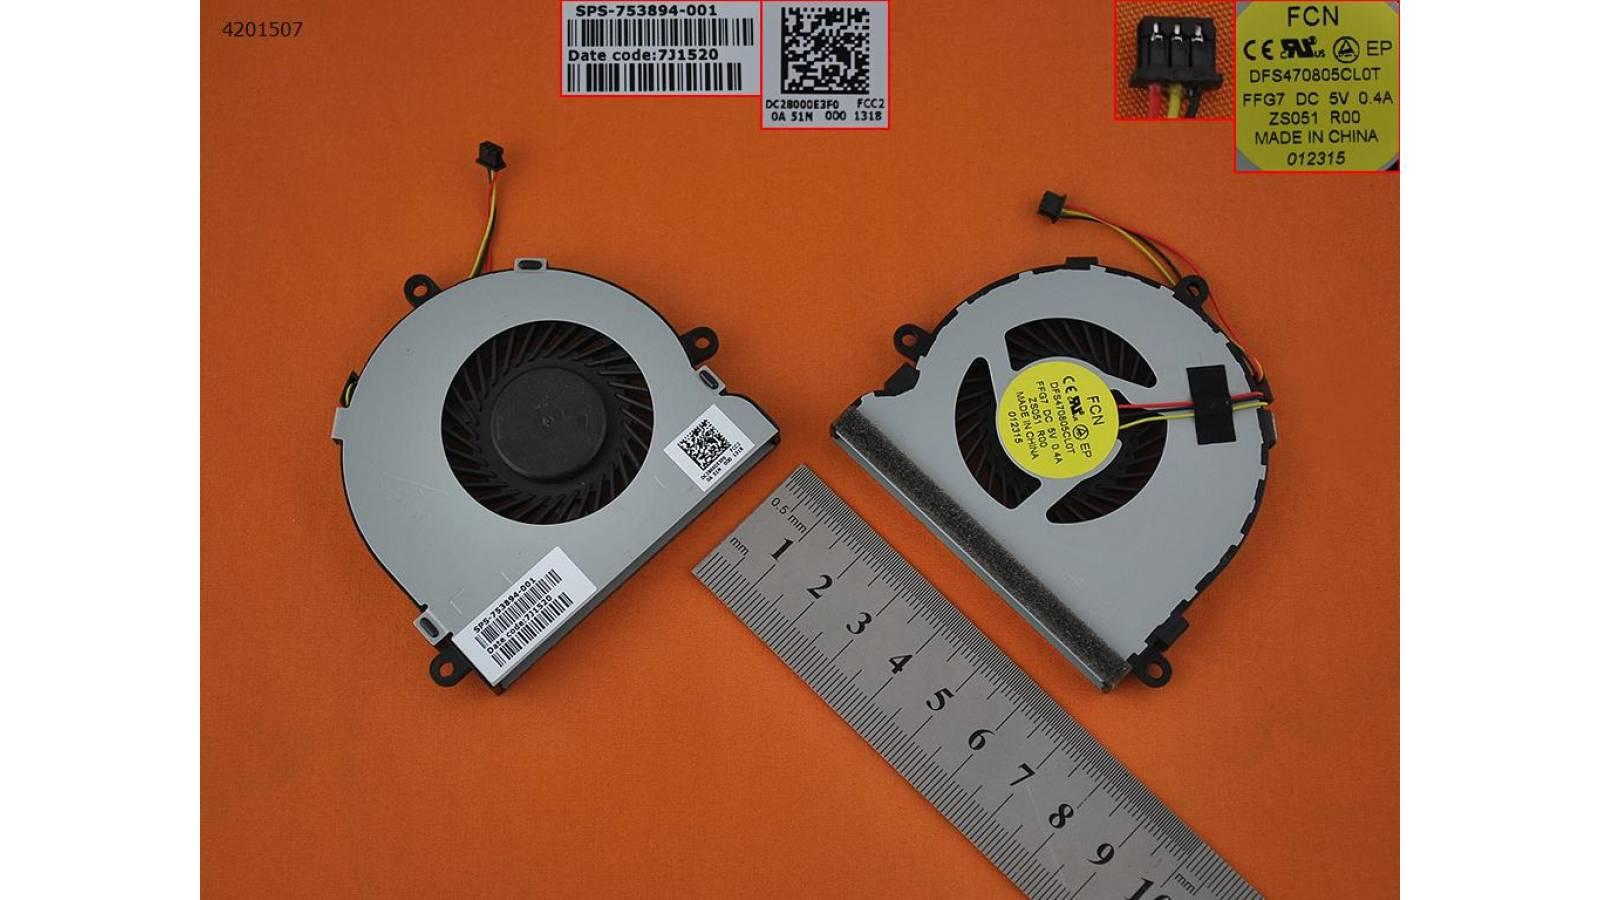 FAN COOLER HP PAVILION 15-G000 15-G100 15-G200 15-R000 15-R100 245 G3 HP 15-G